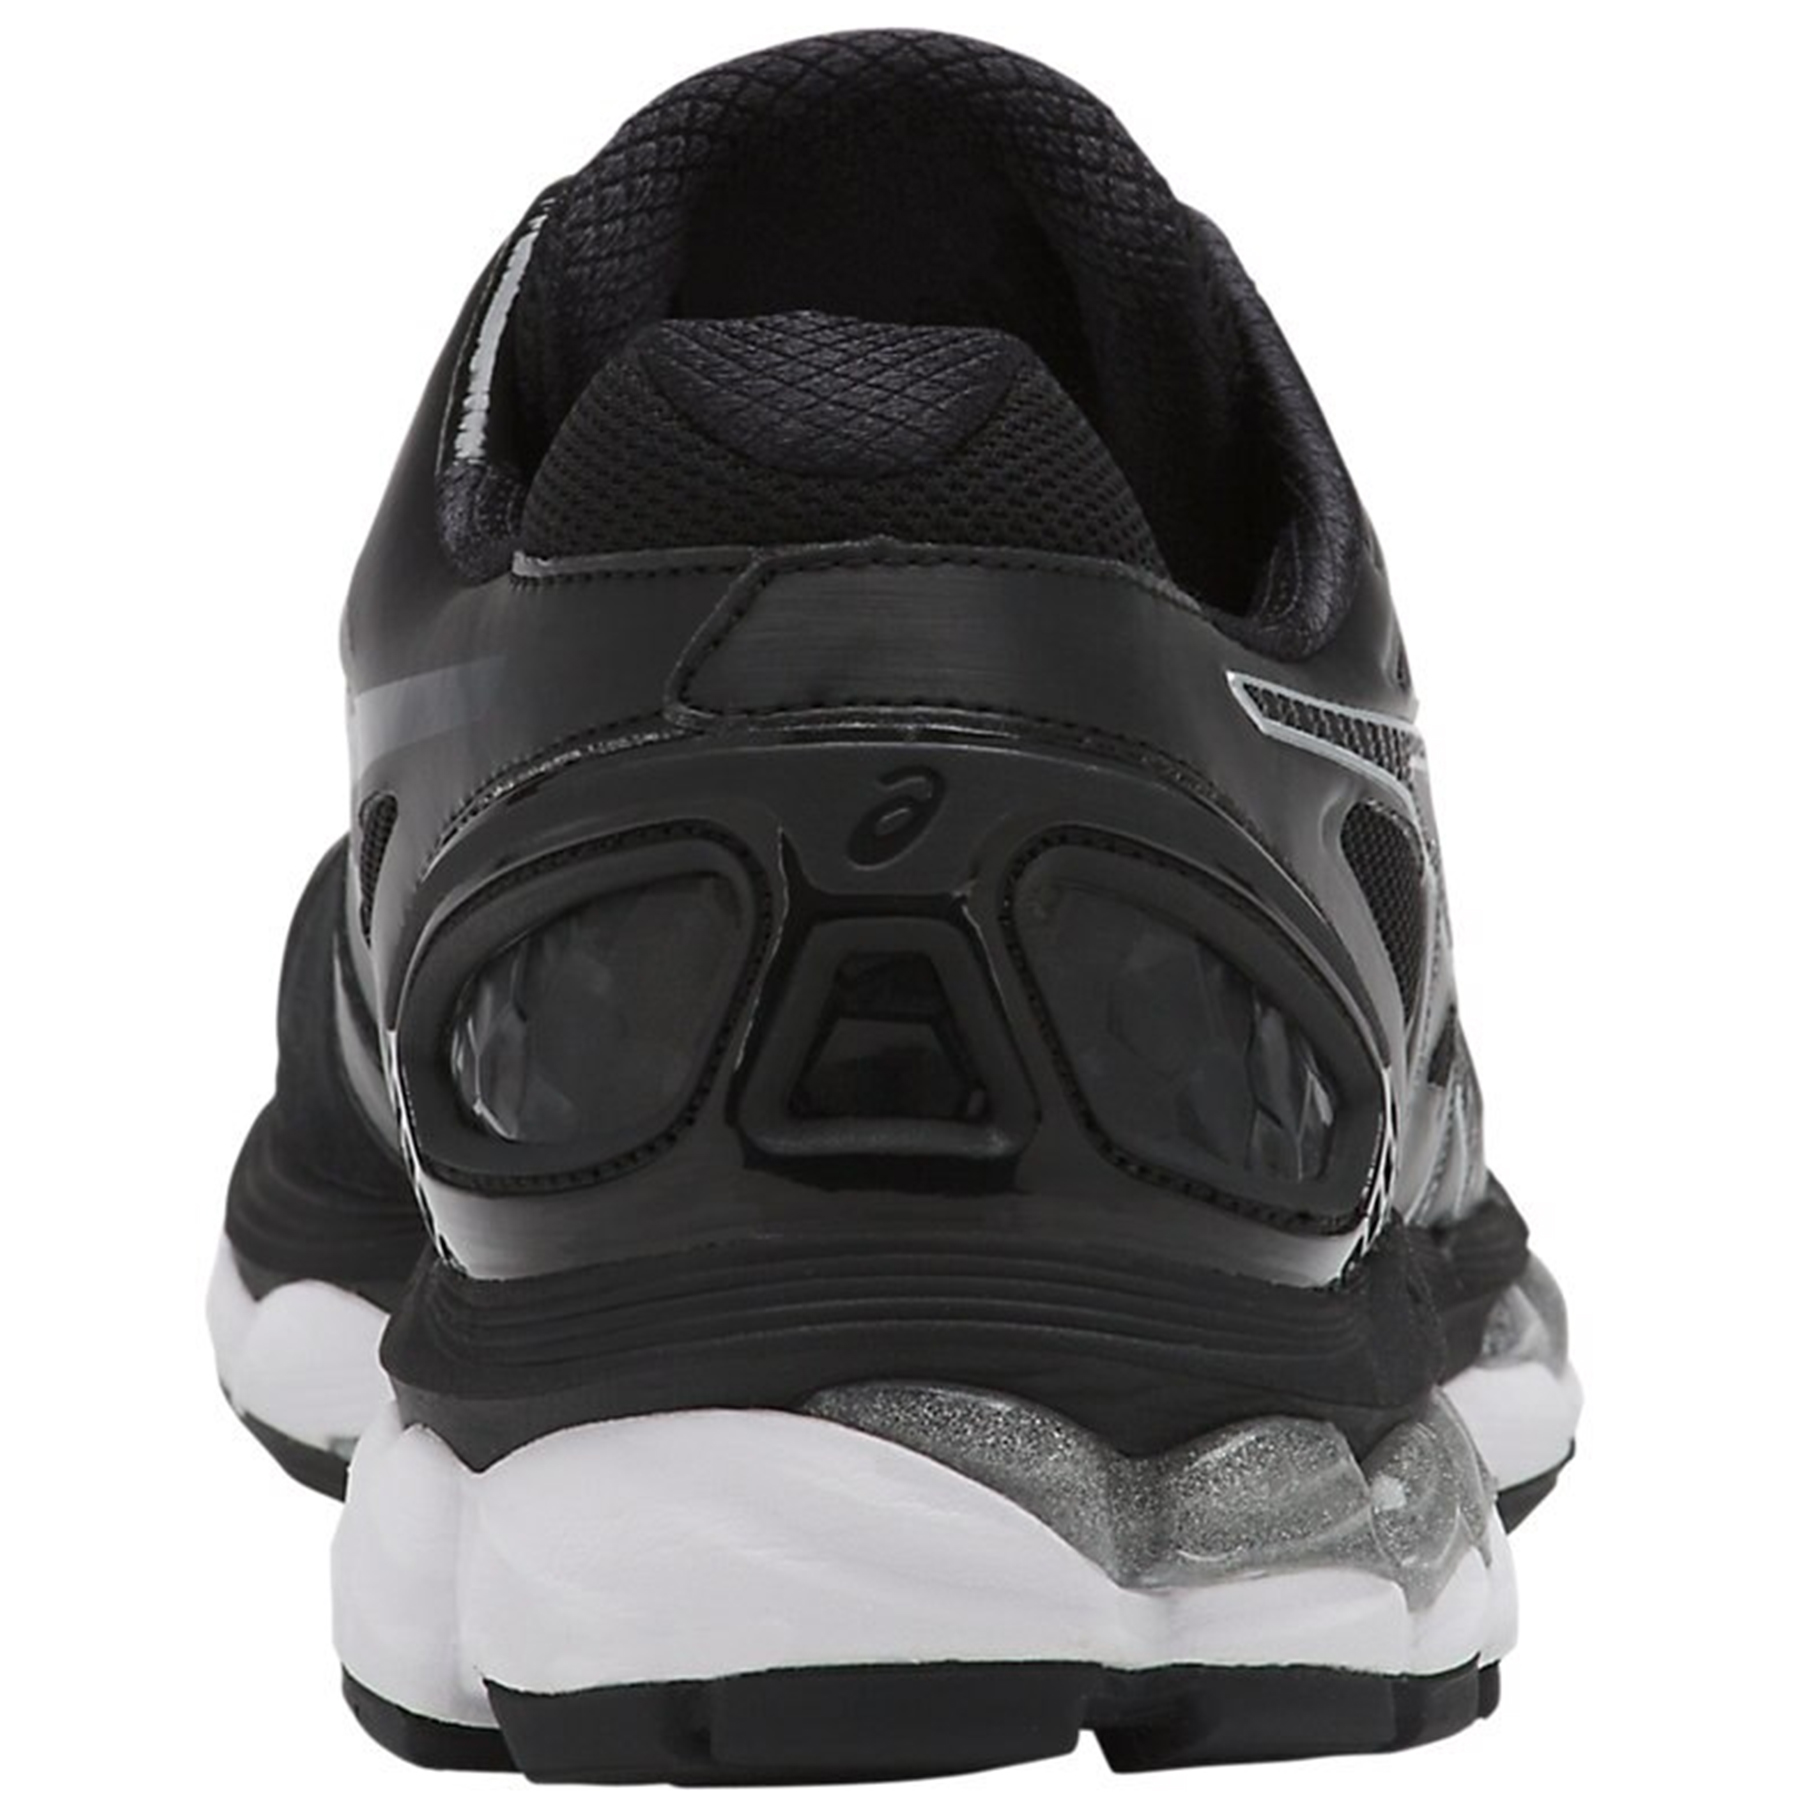 Asics Gel-800XTR - Kelly's Footwear